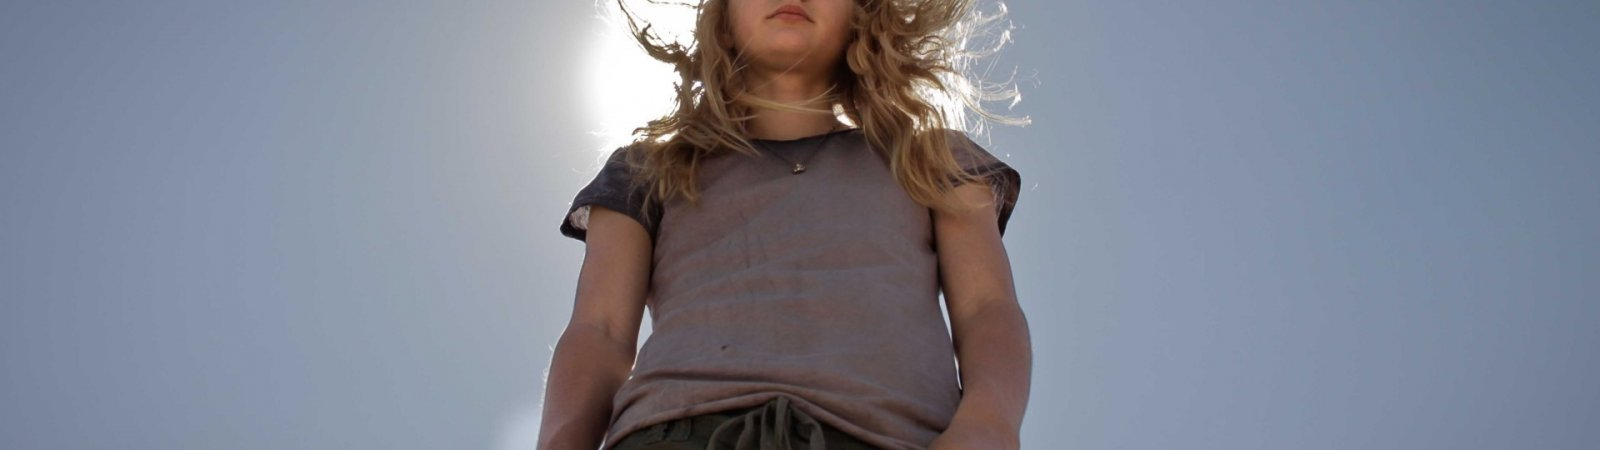 Photo dernier film Tawny Fere